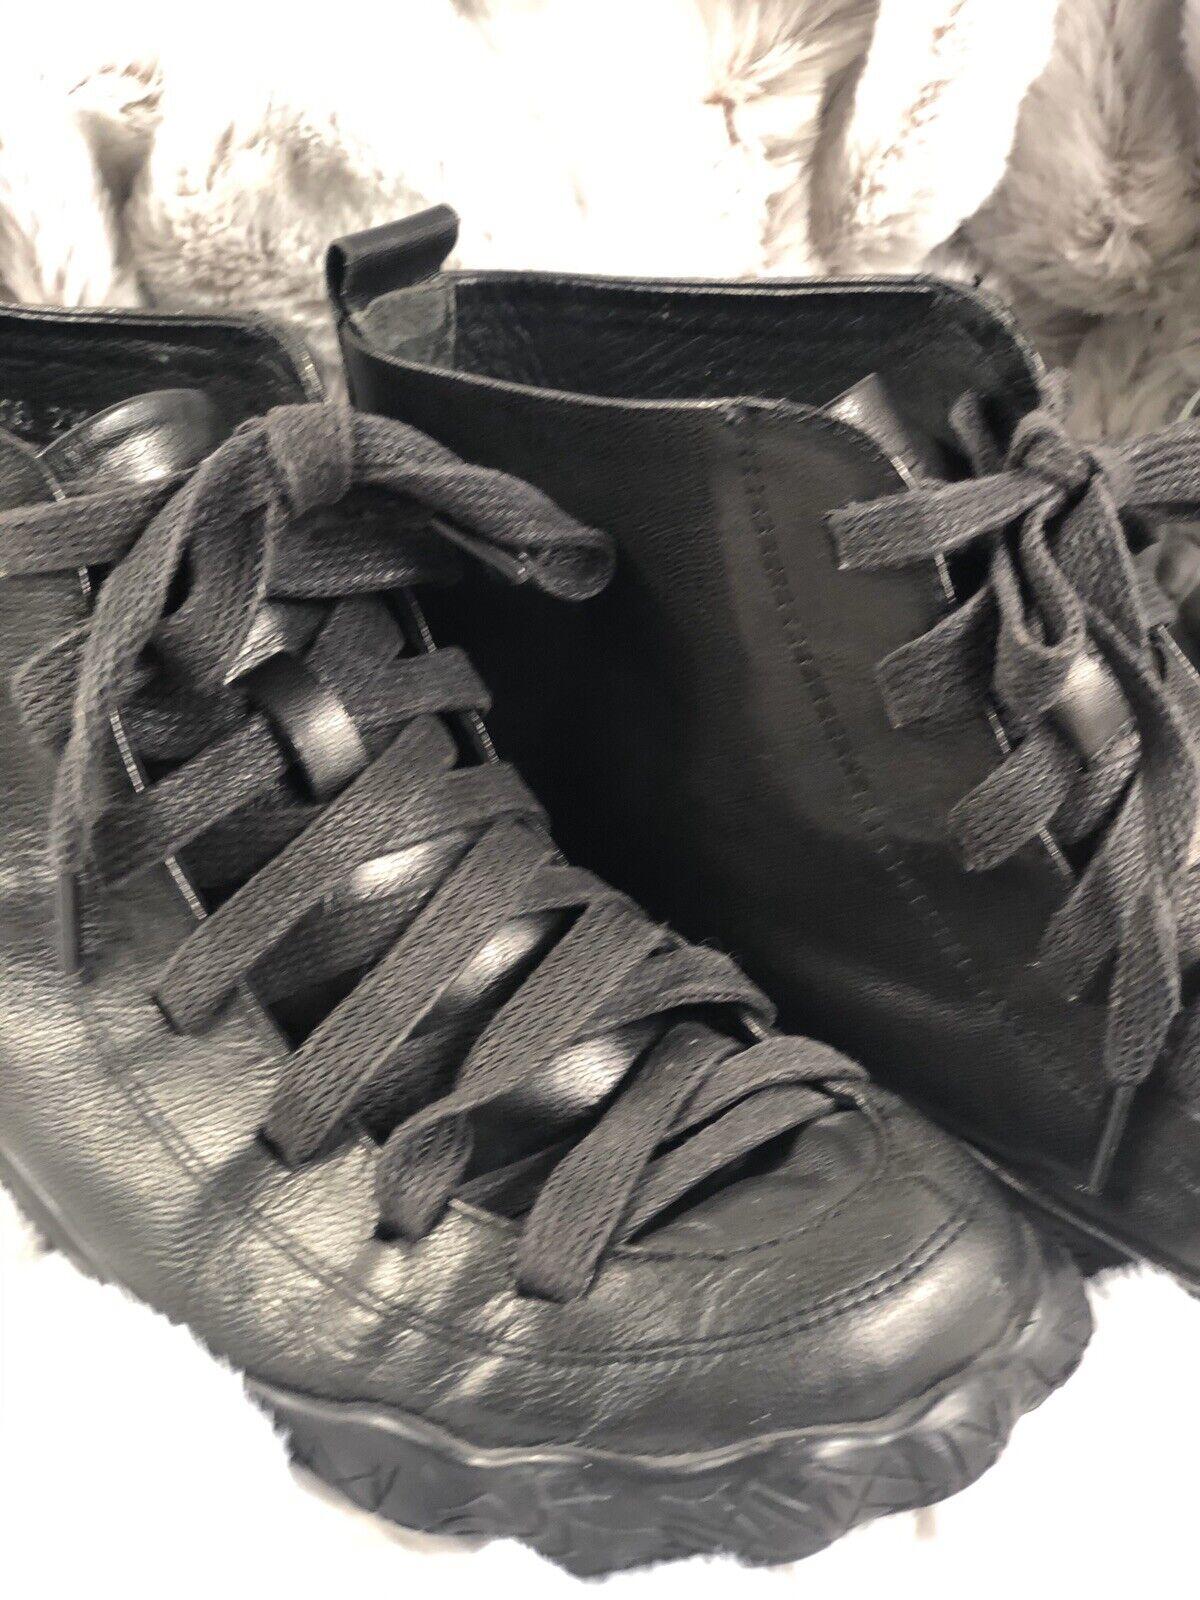 Velobas pour Femme en Cuir Noir Hightop Sneaker 6.5